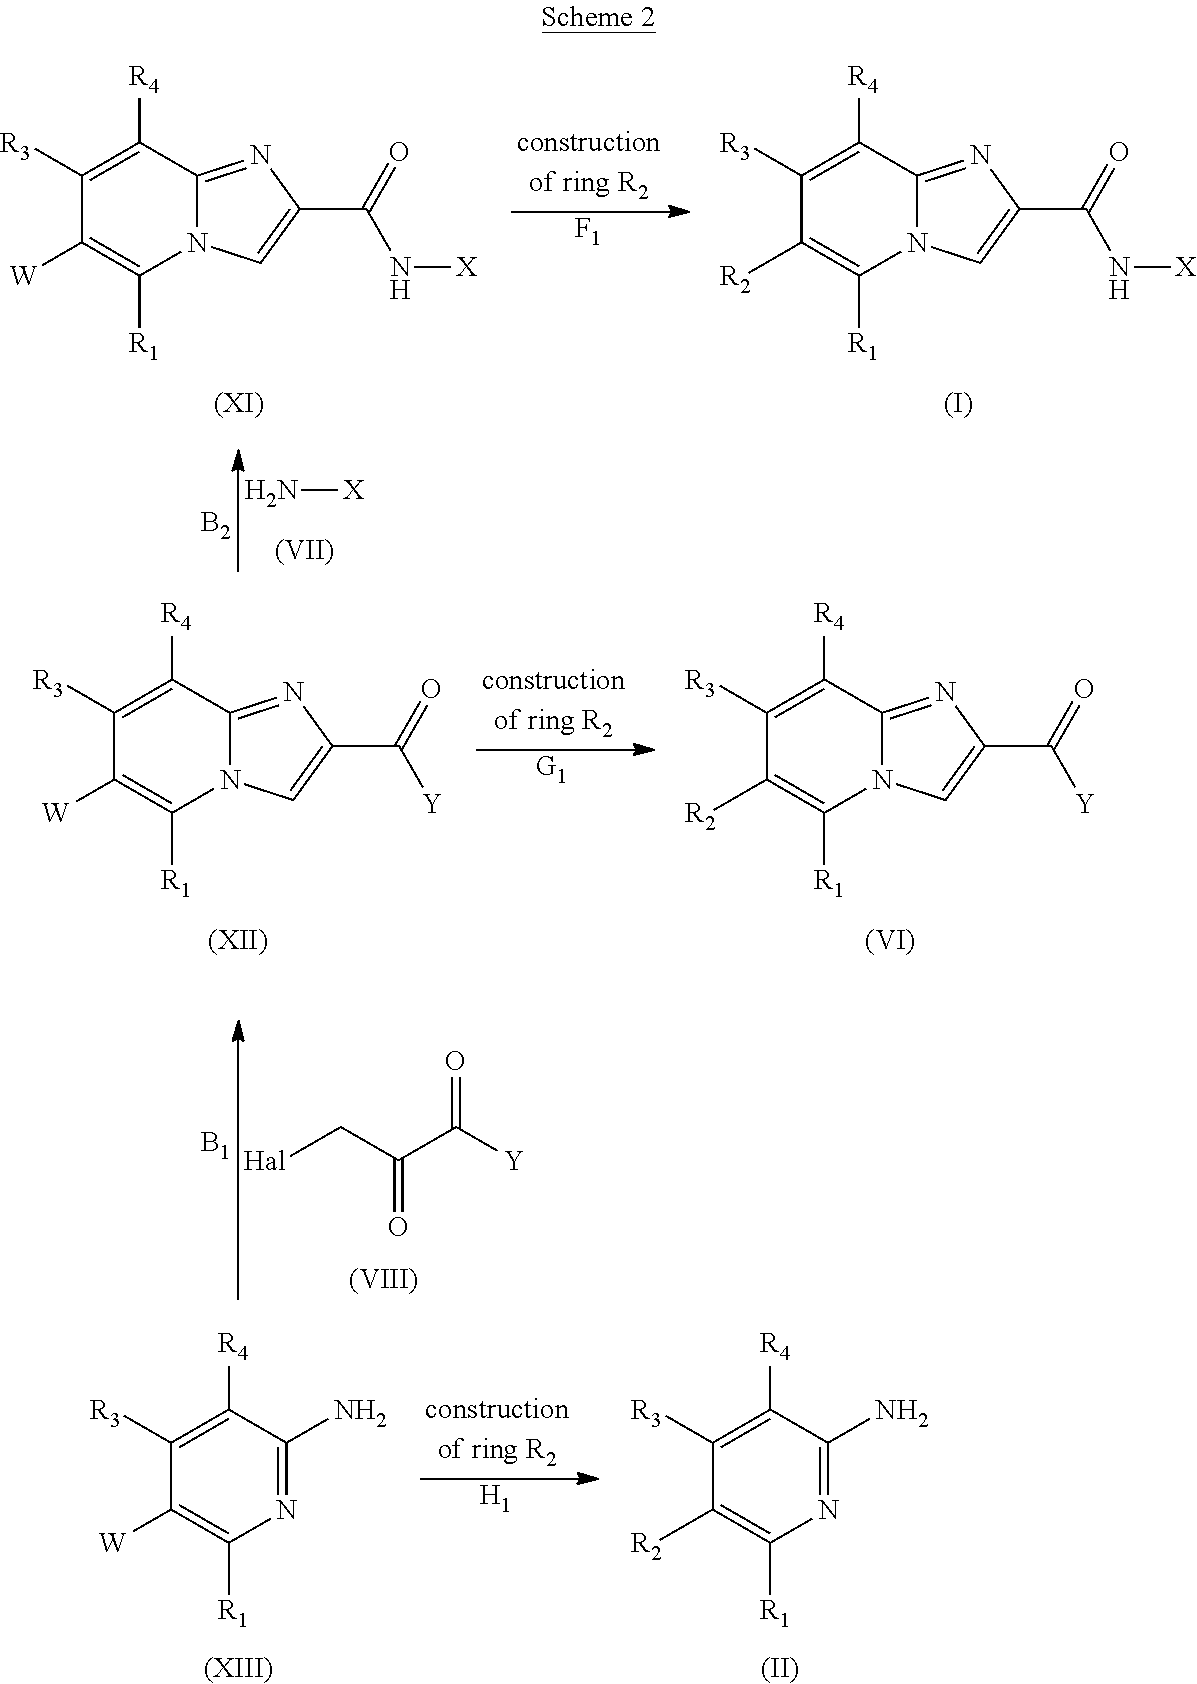 Us8691990b2 6 heterocyclic imidazo12 pyridine 2 carboxamide figure us08691990 20140408 c00004 fandeluxe Choice Image